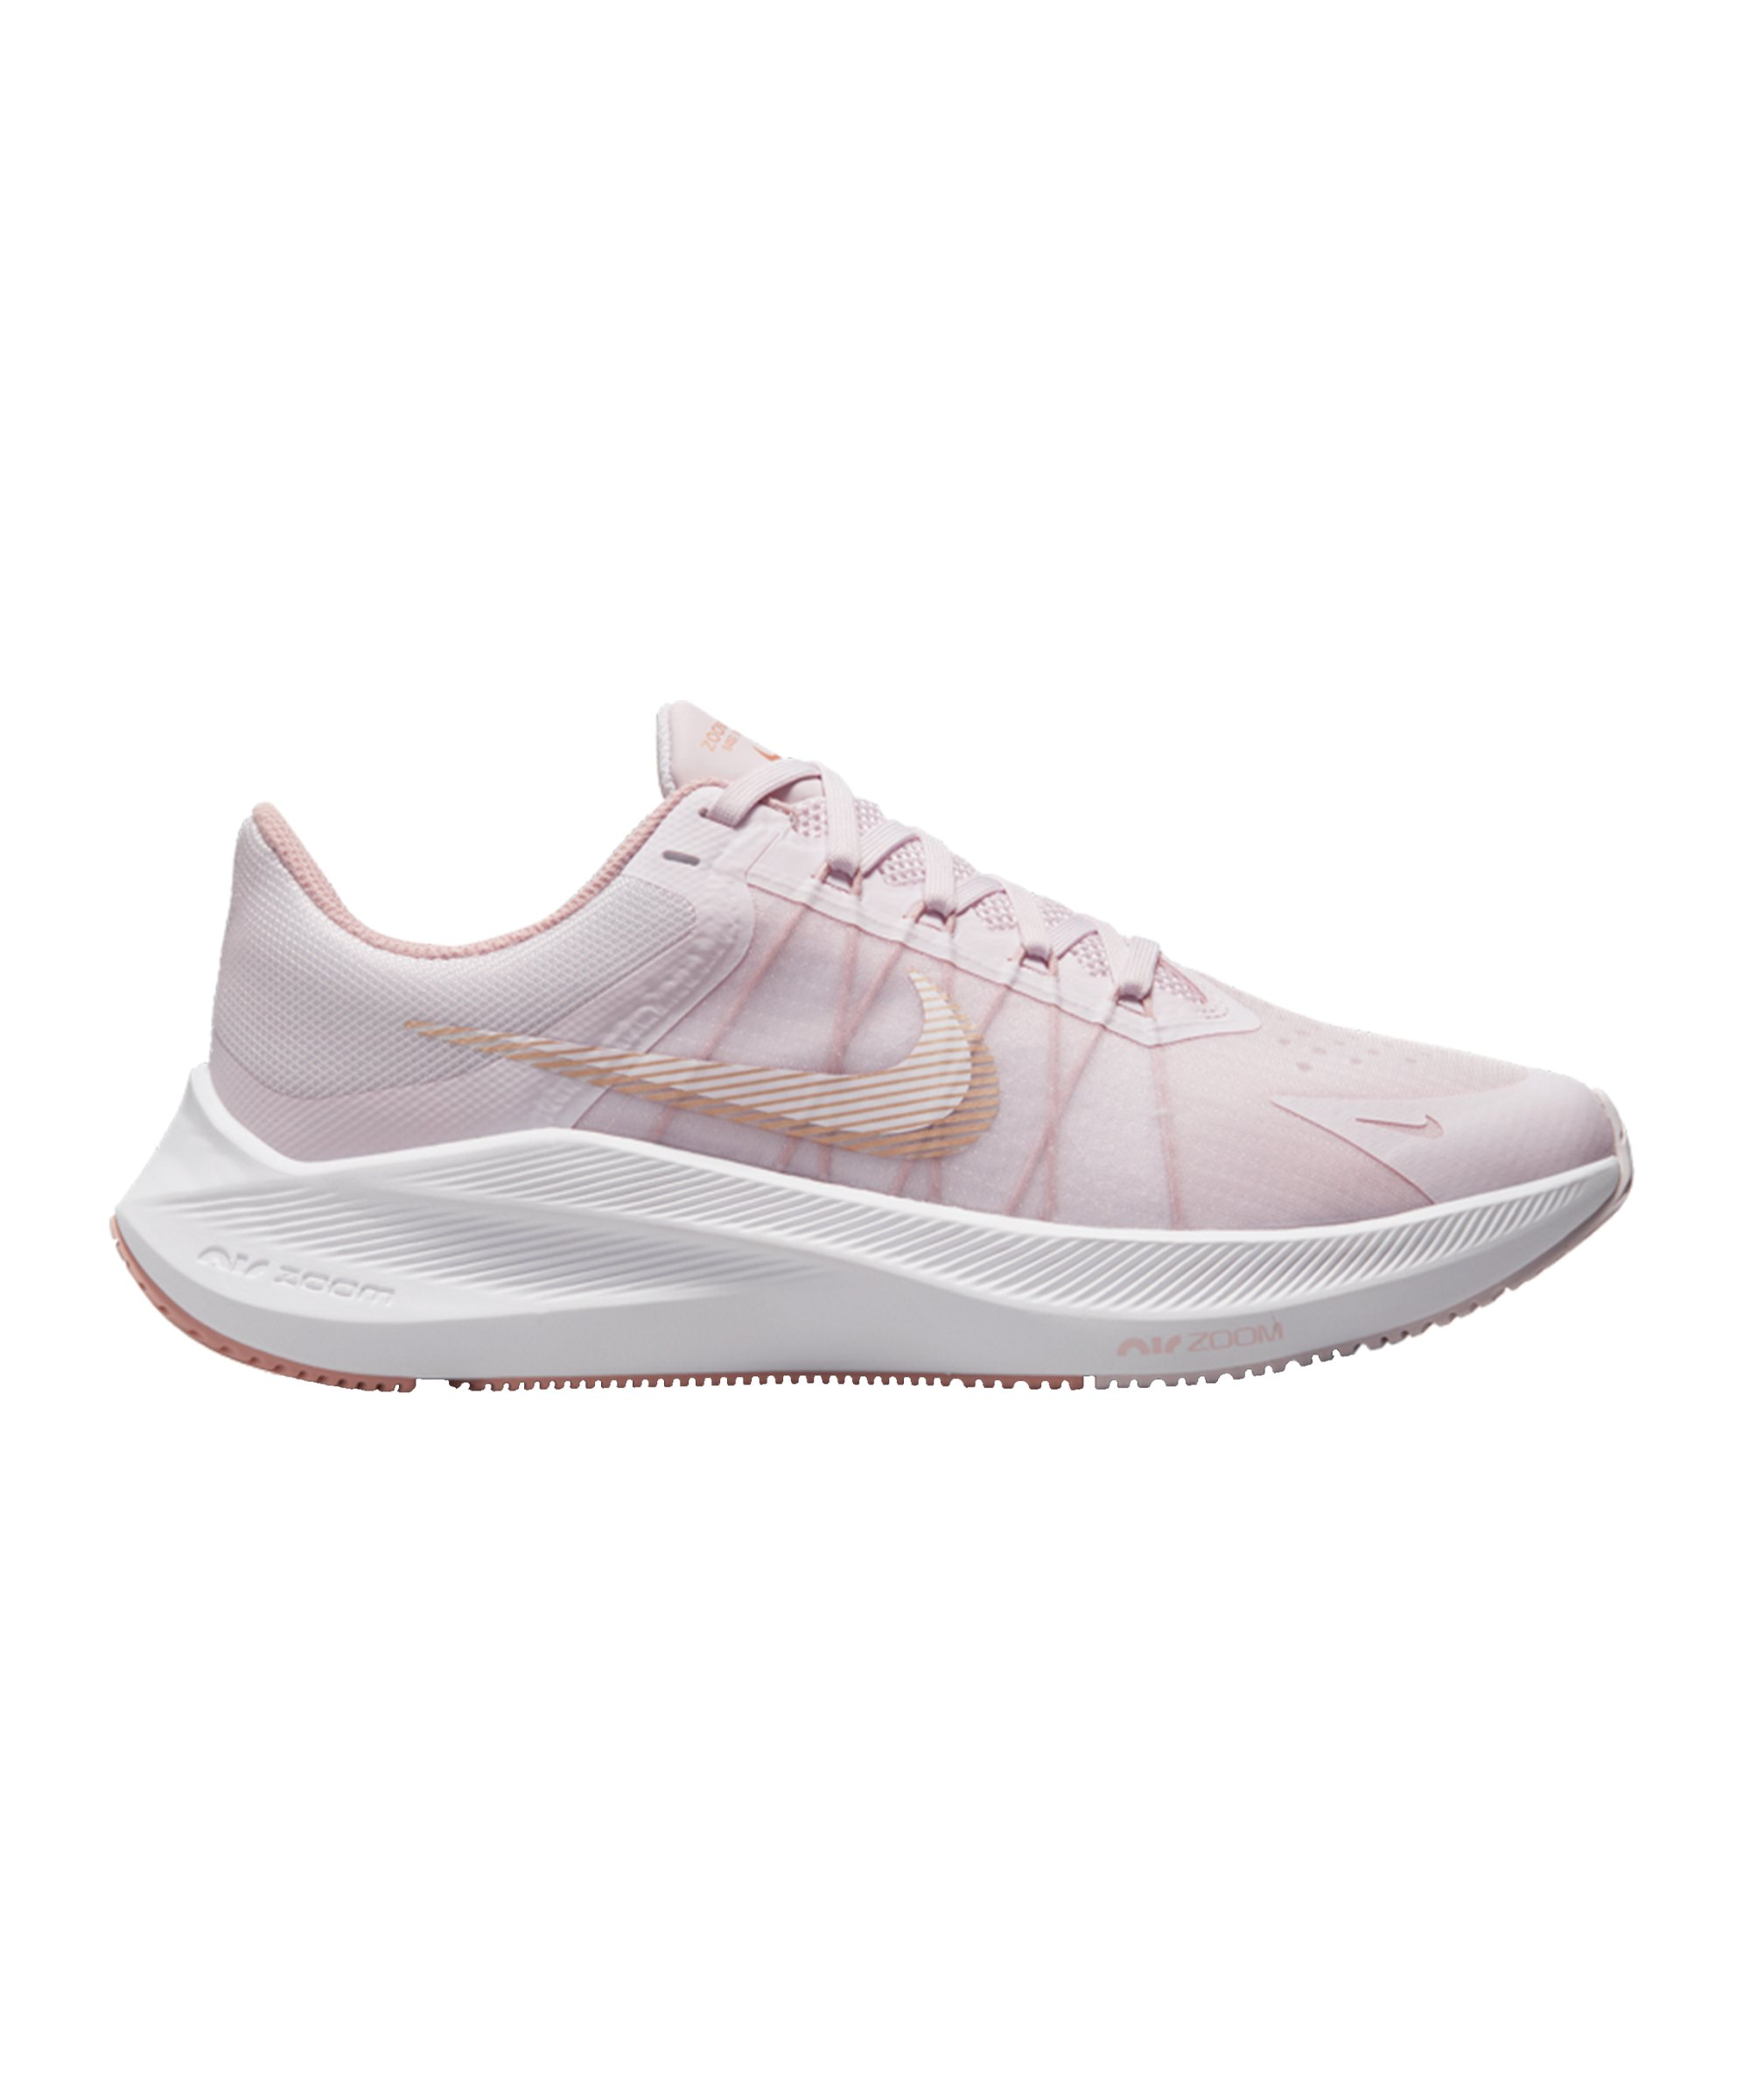 Nike Zoom Winflo 8 Running Damen Rosa F500 - rosa